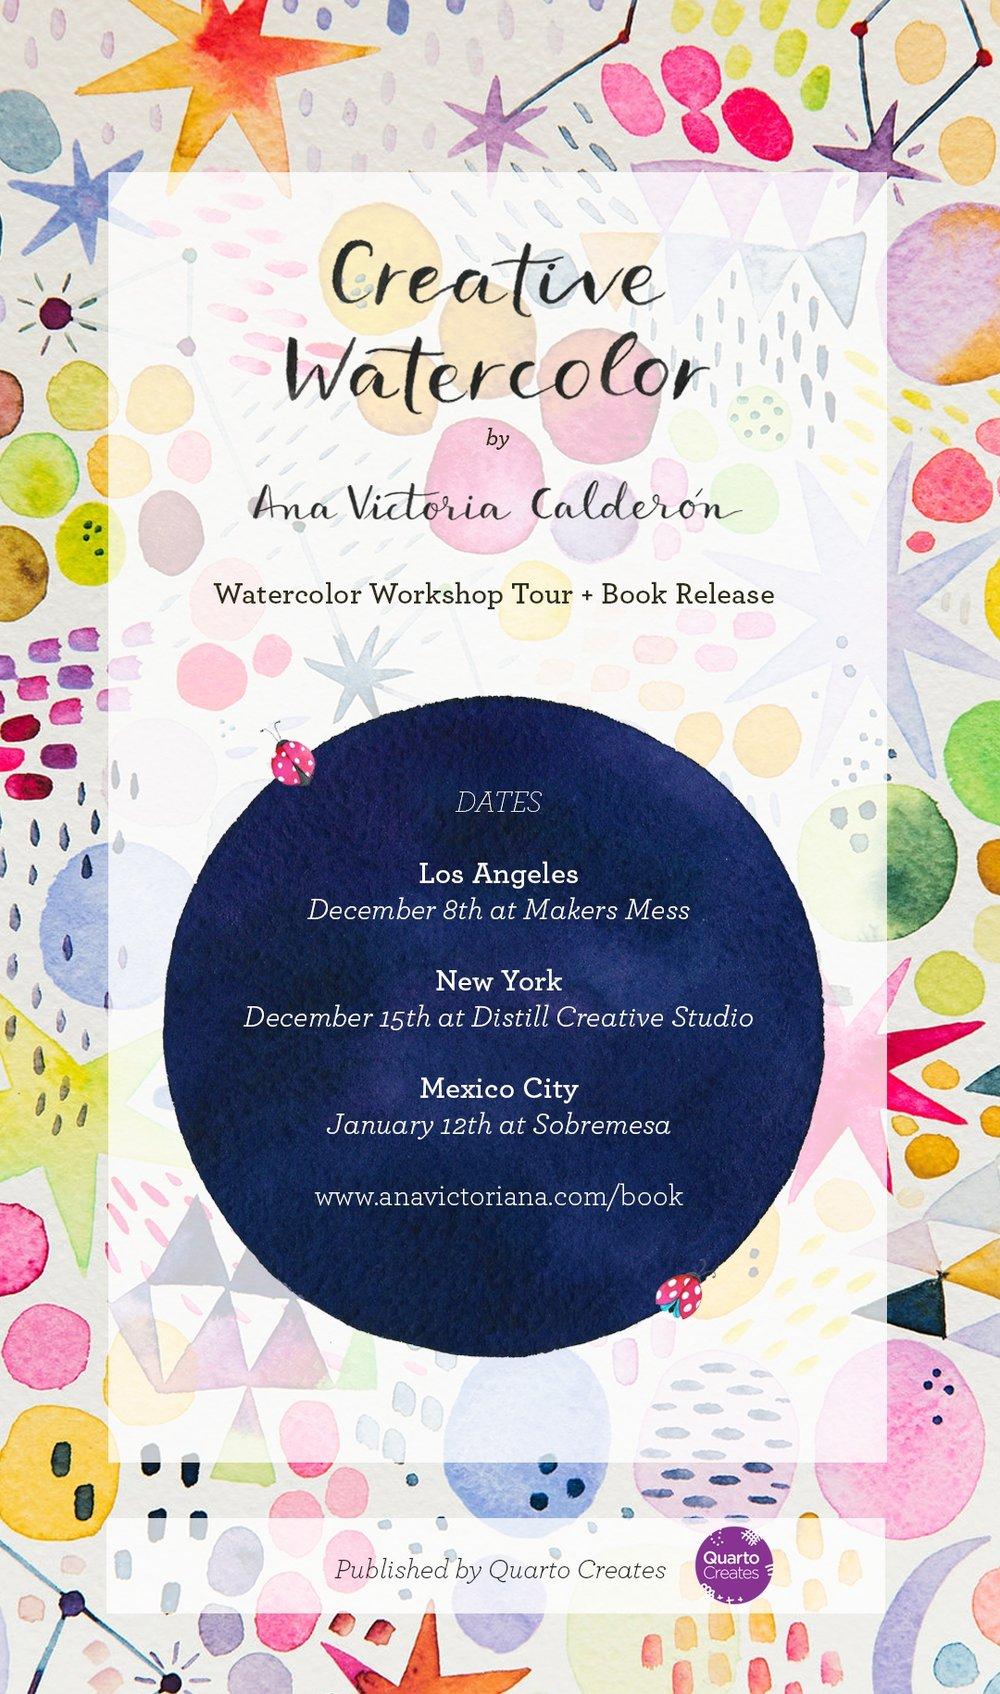 creative-watercolor-ana-victoria-calderon.jpg